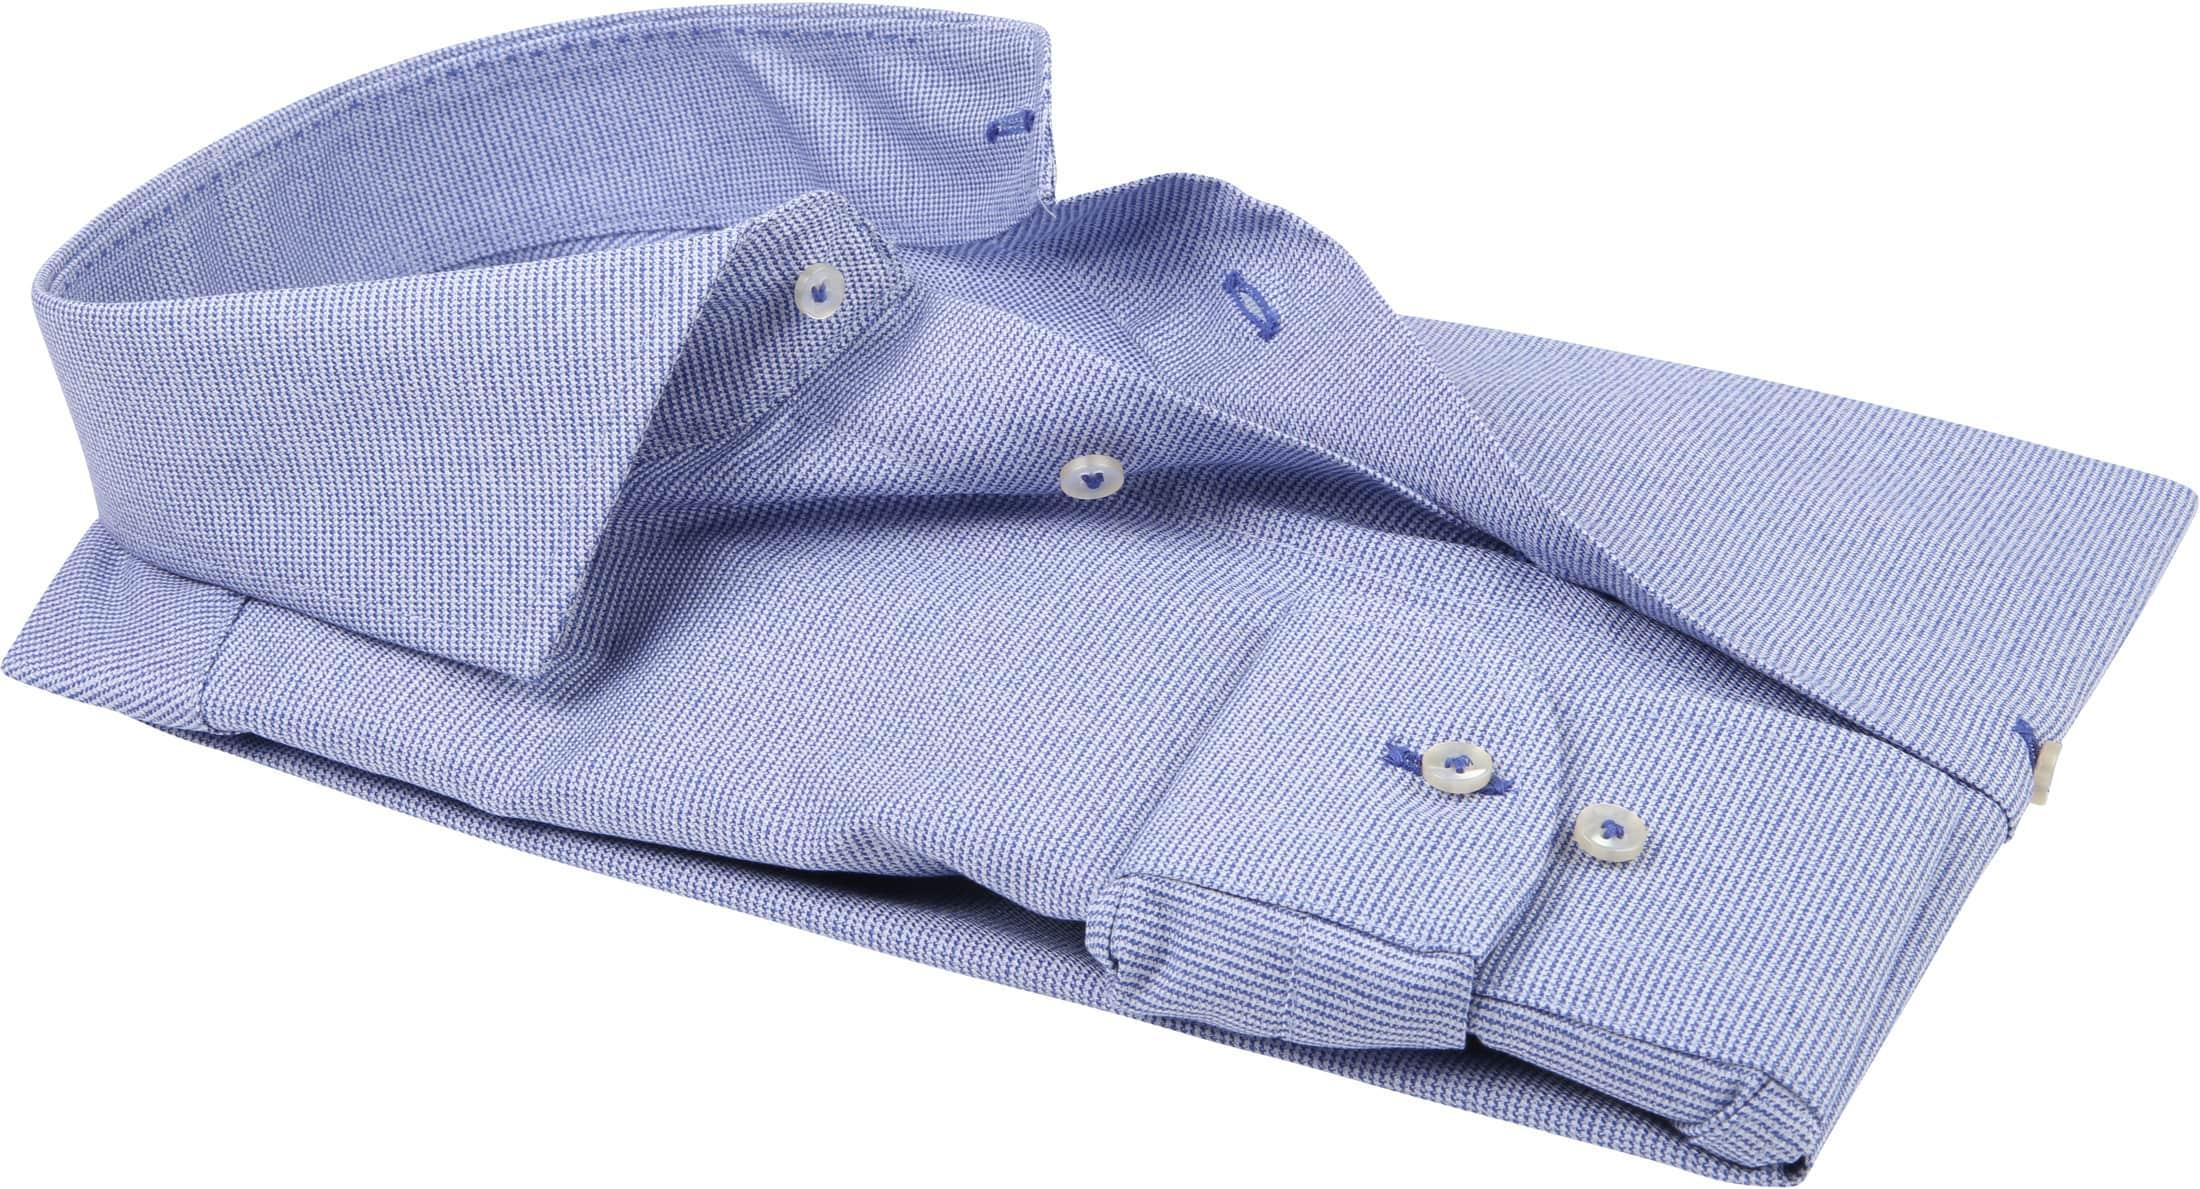 Profuomo Overhemd CAW PDP Blauw foto 2